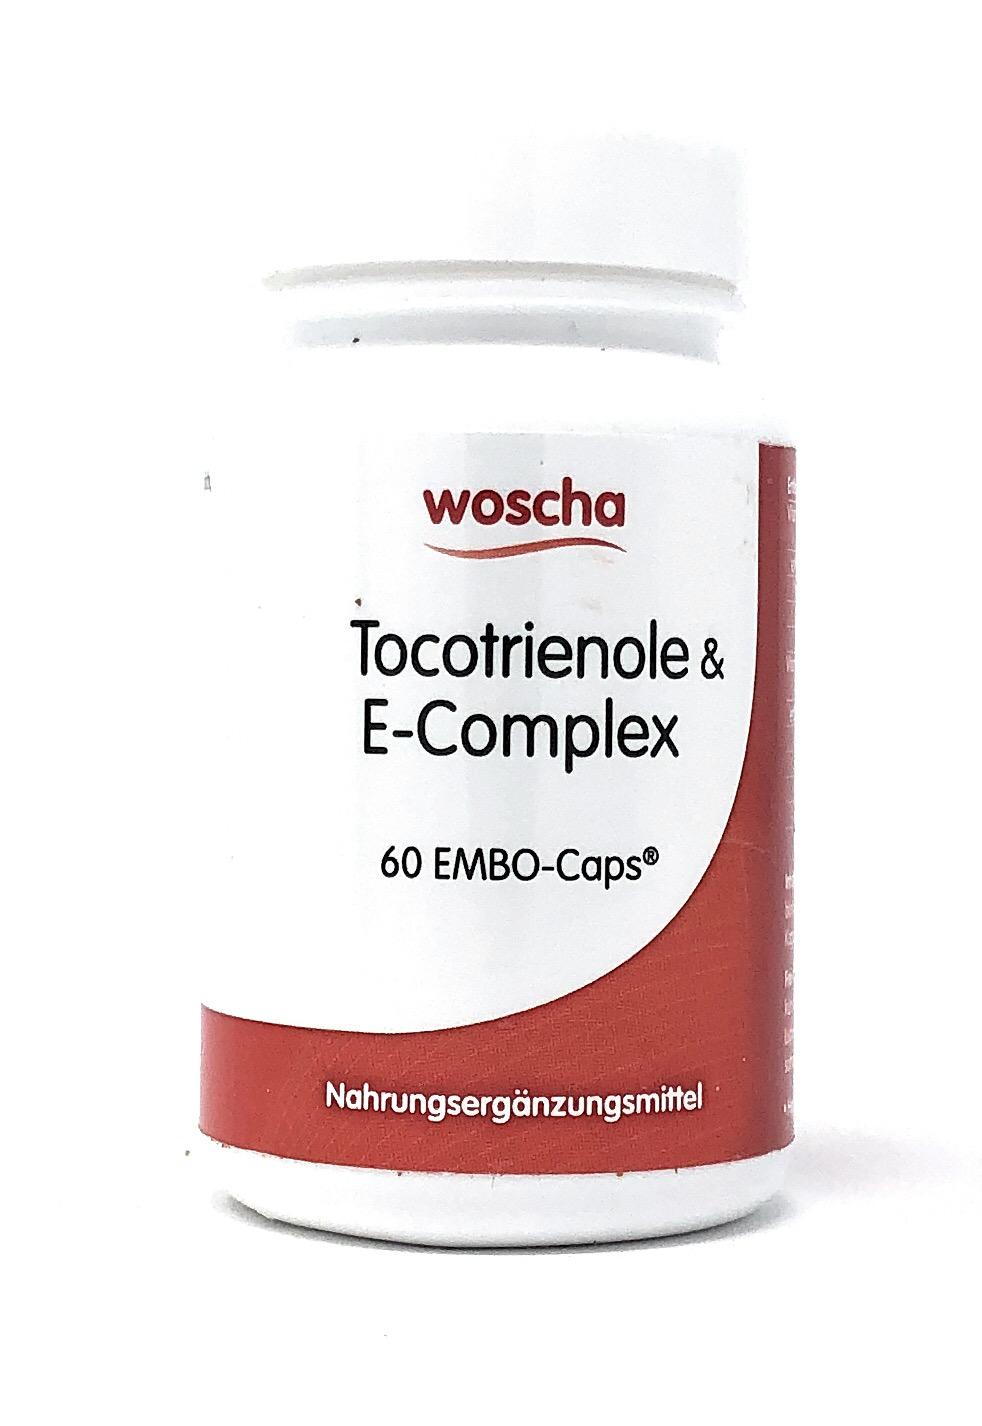 woscha Tocotrienole & E-Complex 60 EMBO-CAPS® (37g) (vegan)